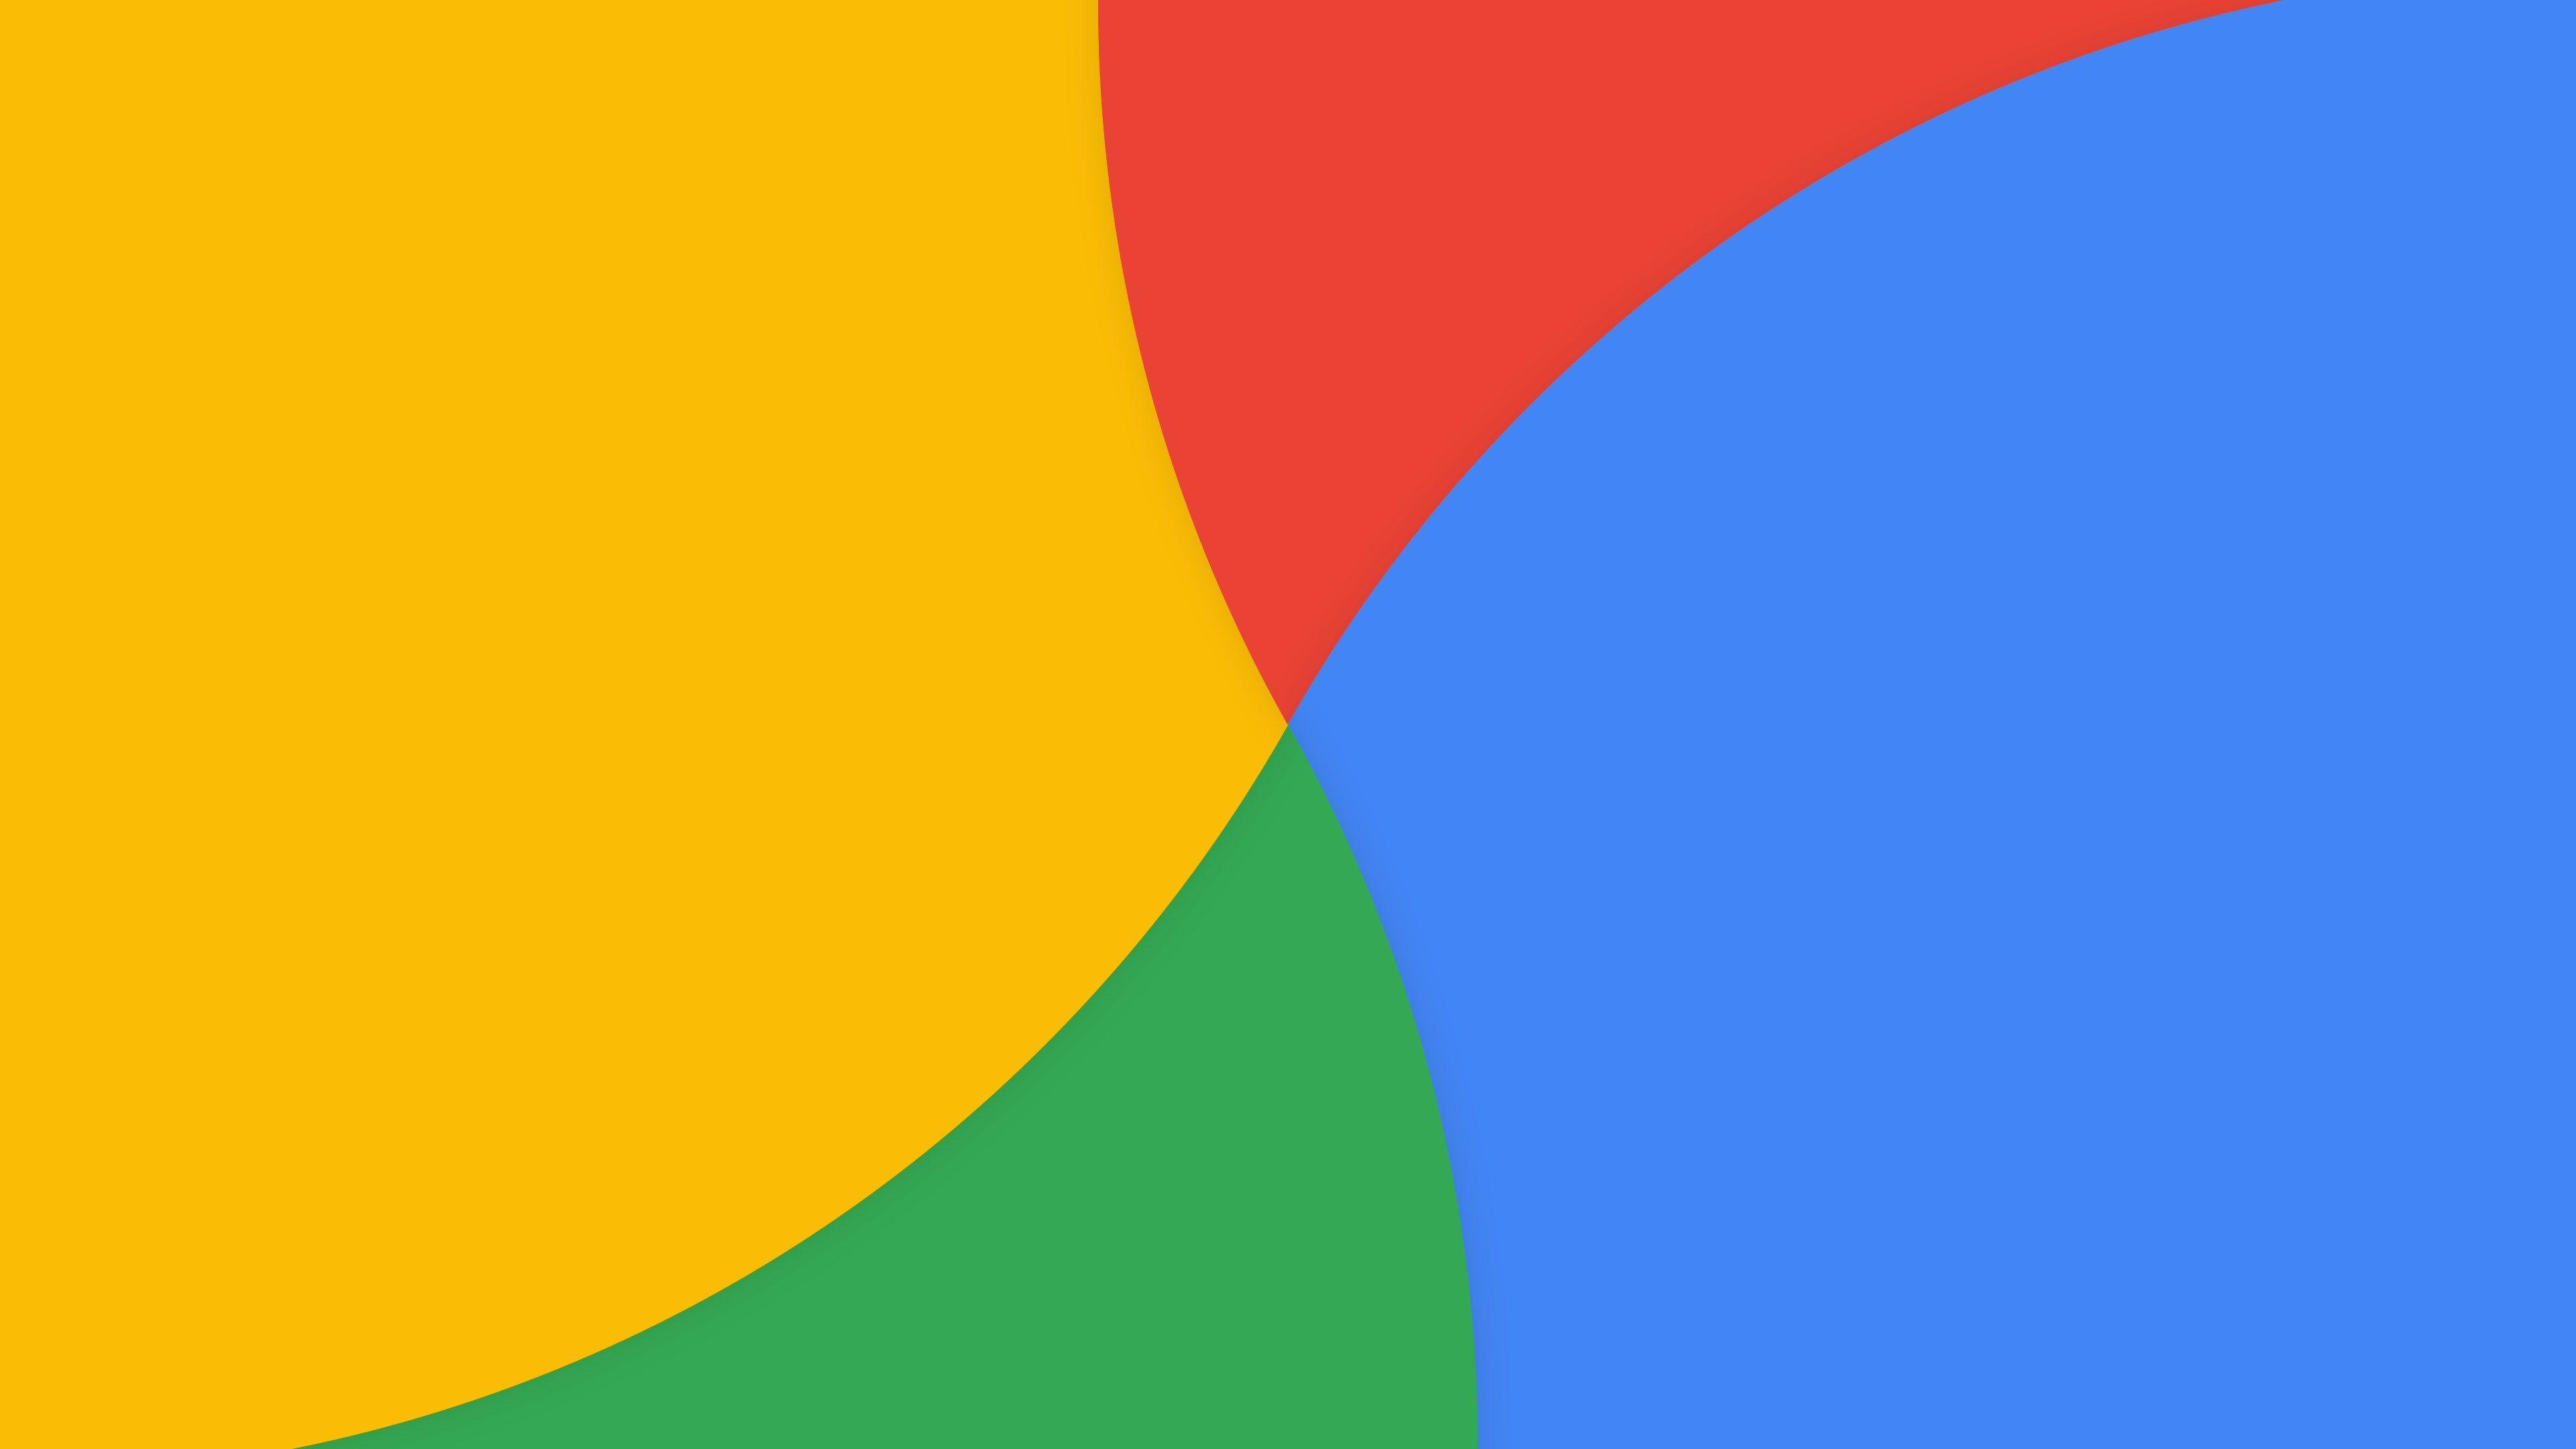 3840x2160 google 4k wallpaper hd for pc Material design